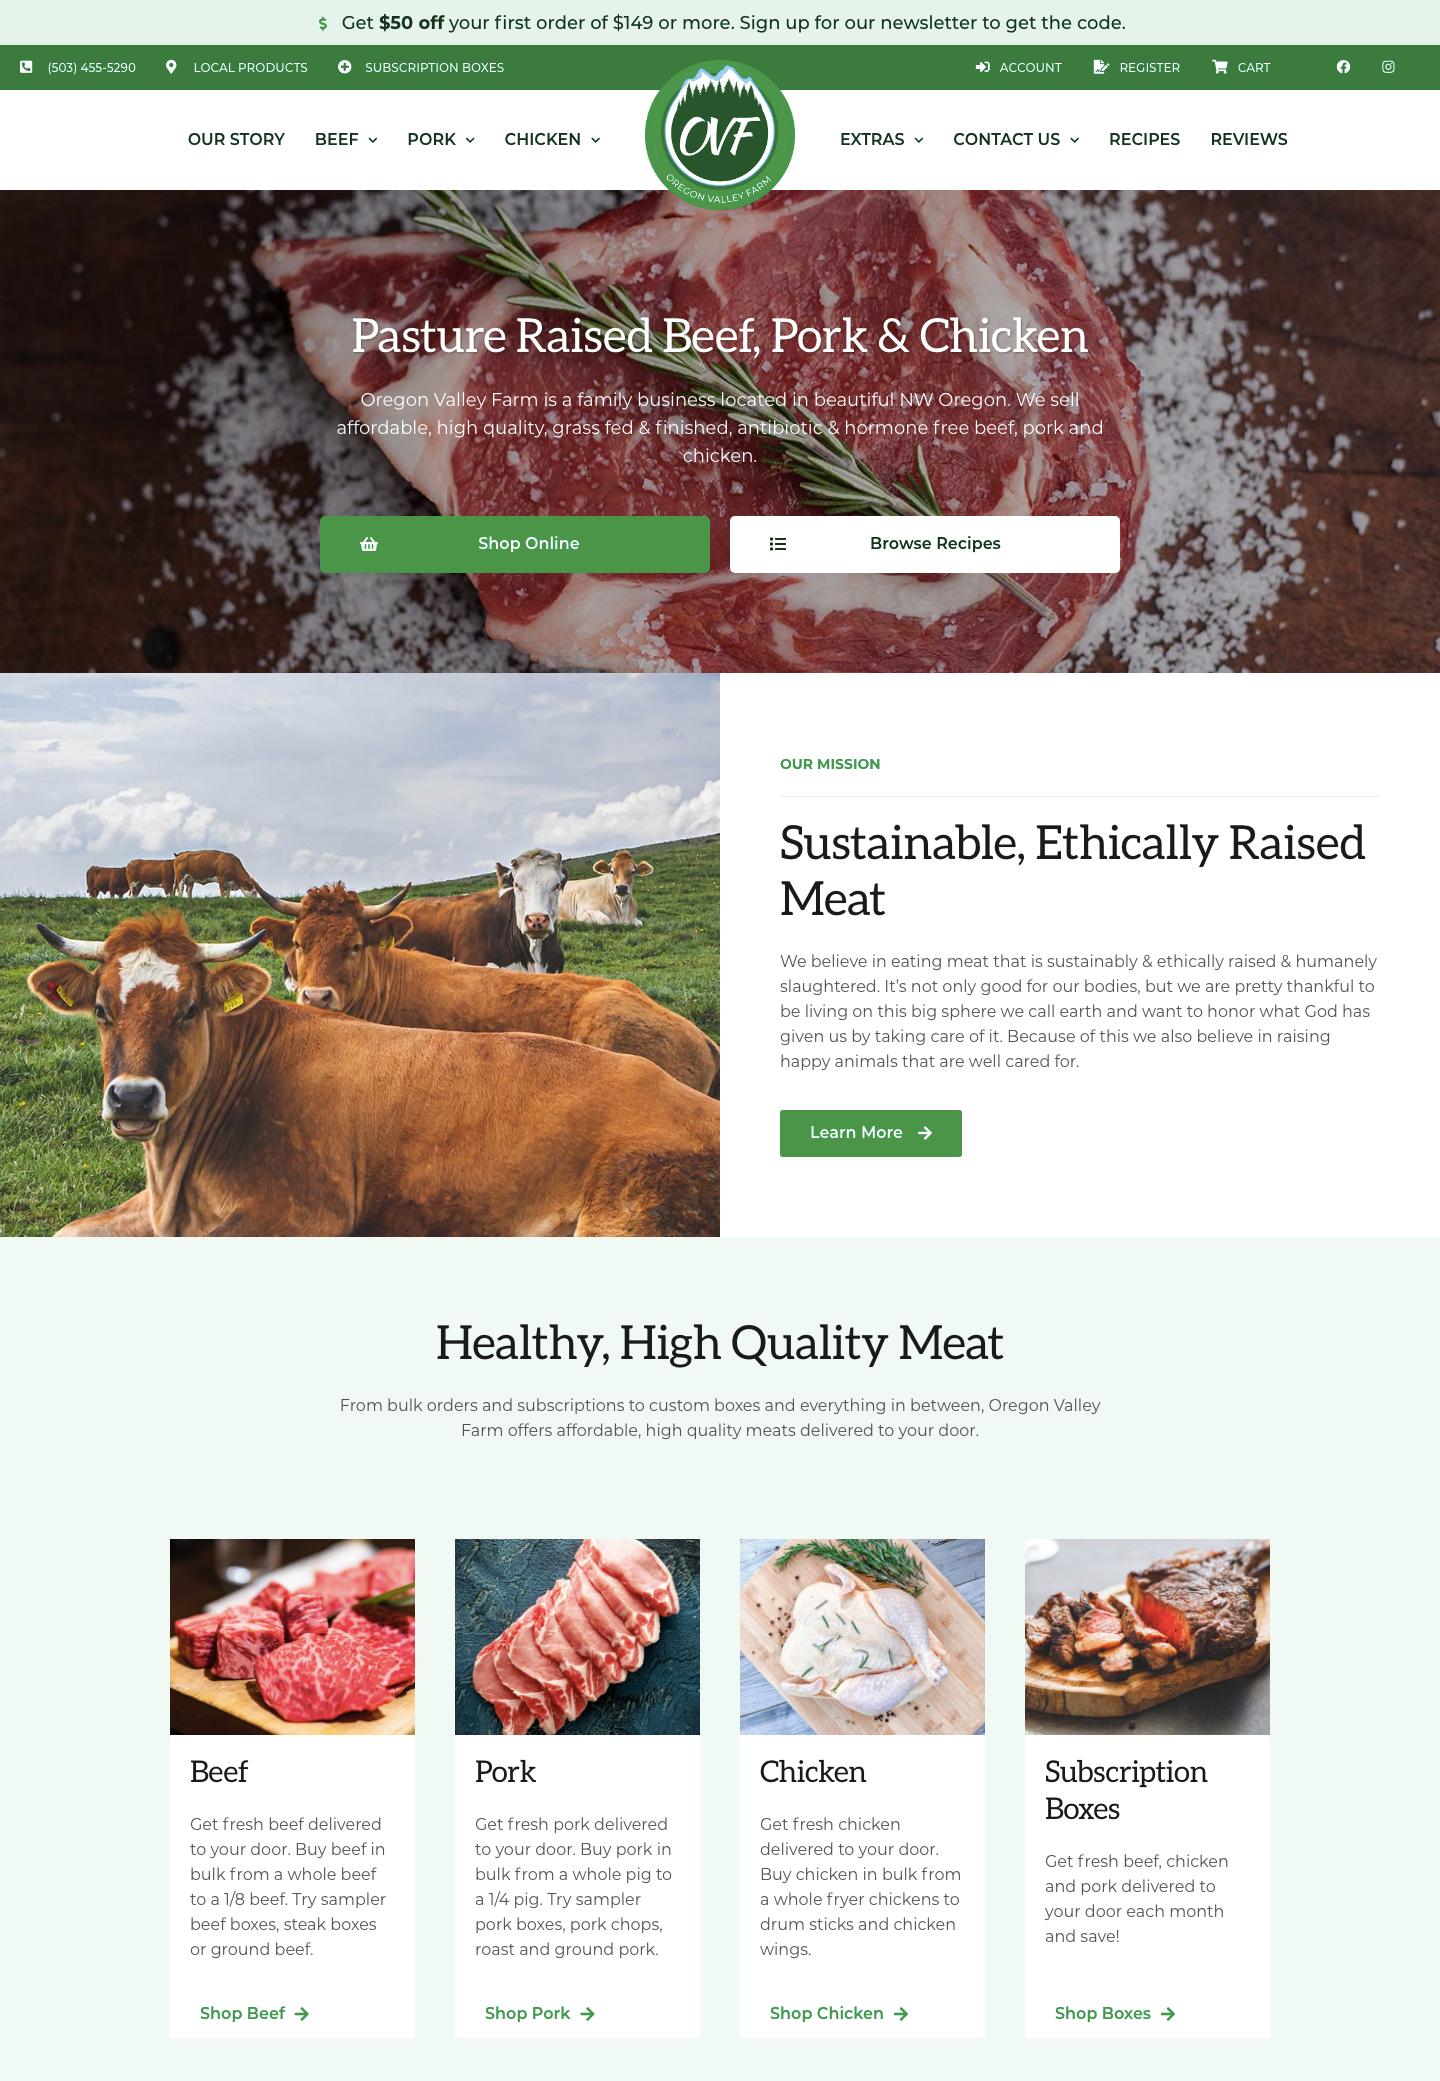 Oregon Valley Farm landing page